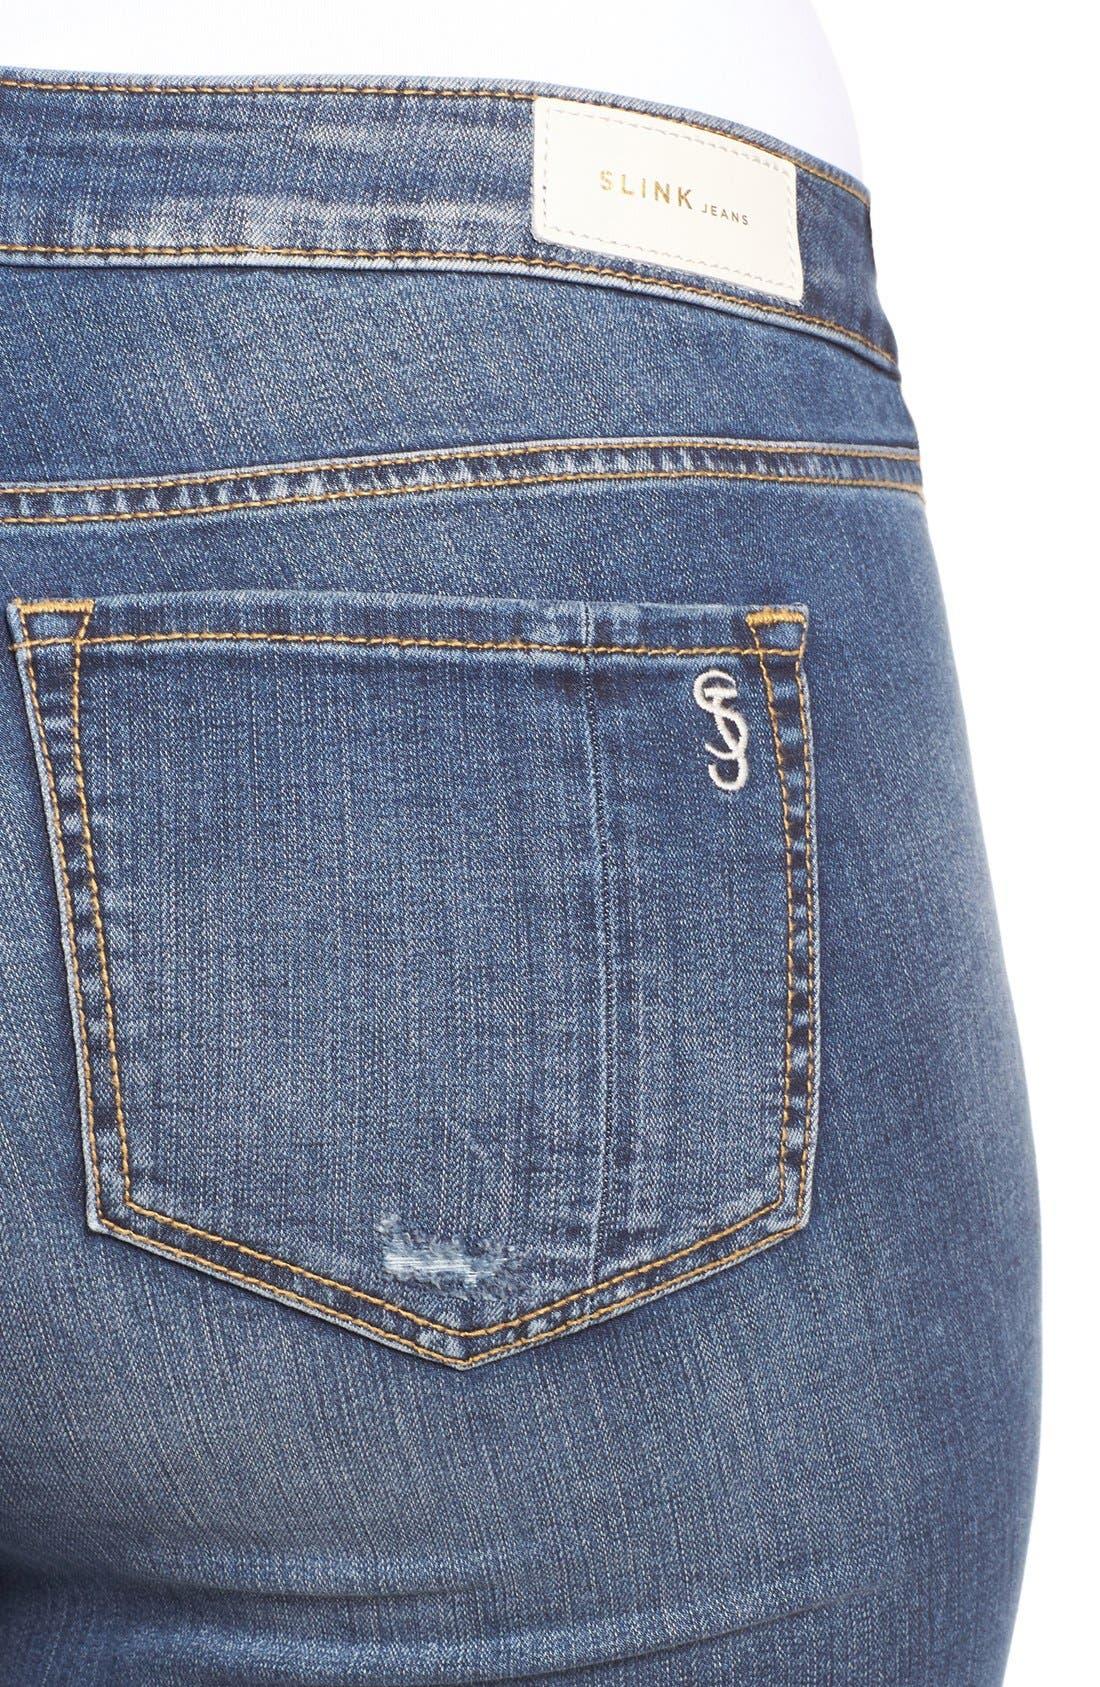 Alternate Image 5  - SLINK Jeans Ripped Stretch Ankle Skinny Jeans (Danika) (Plus Size)